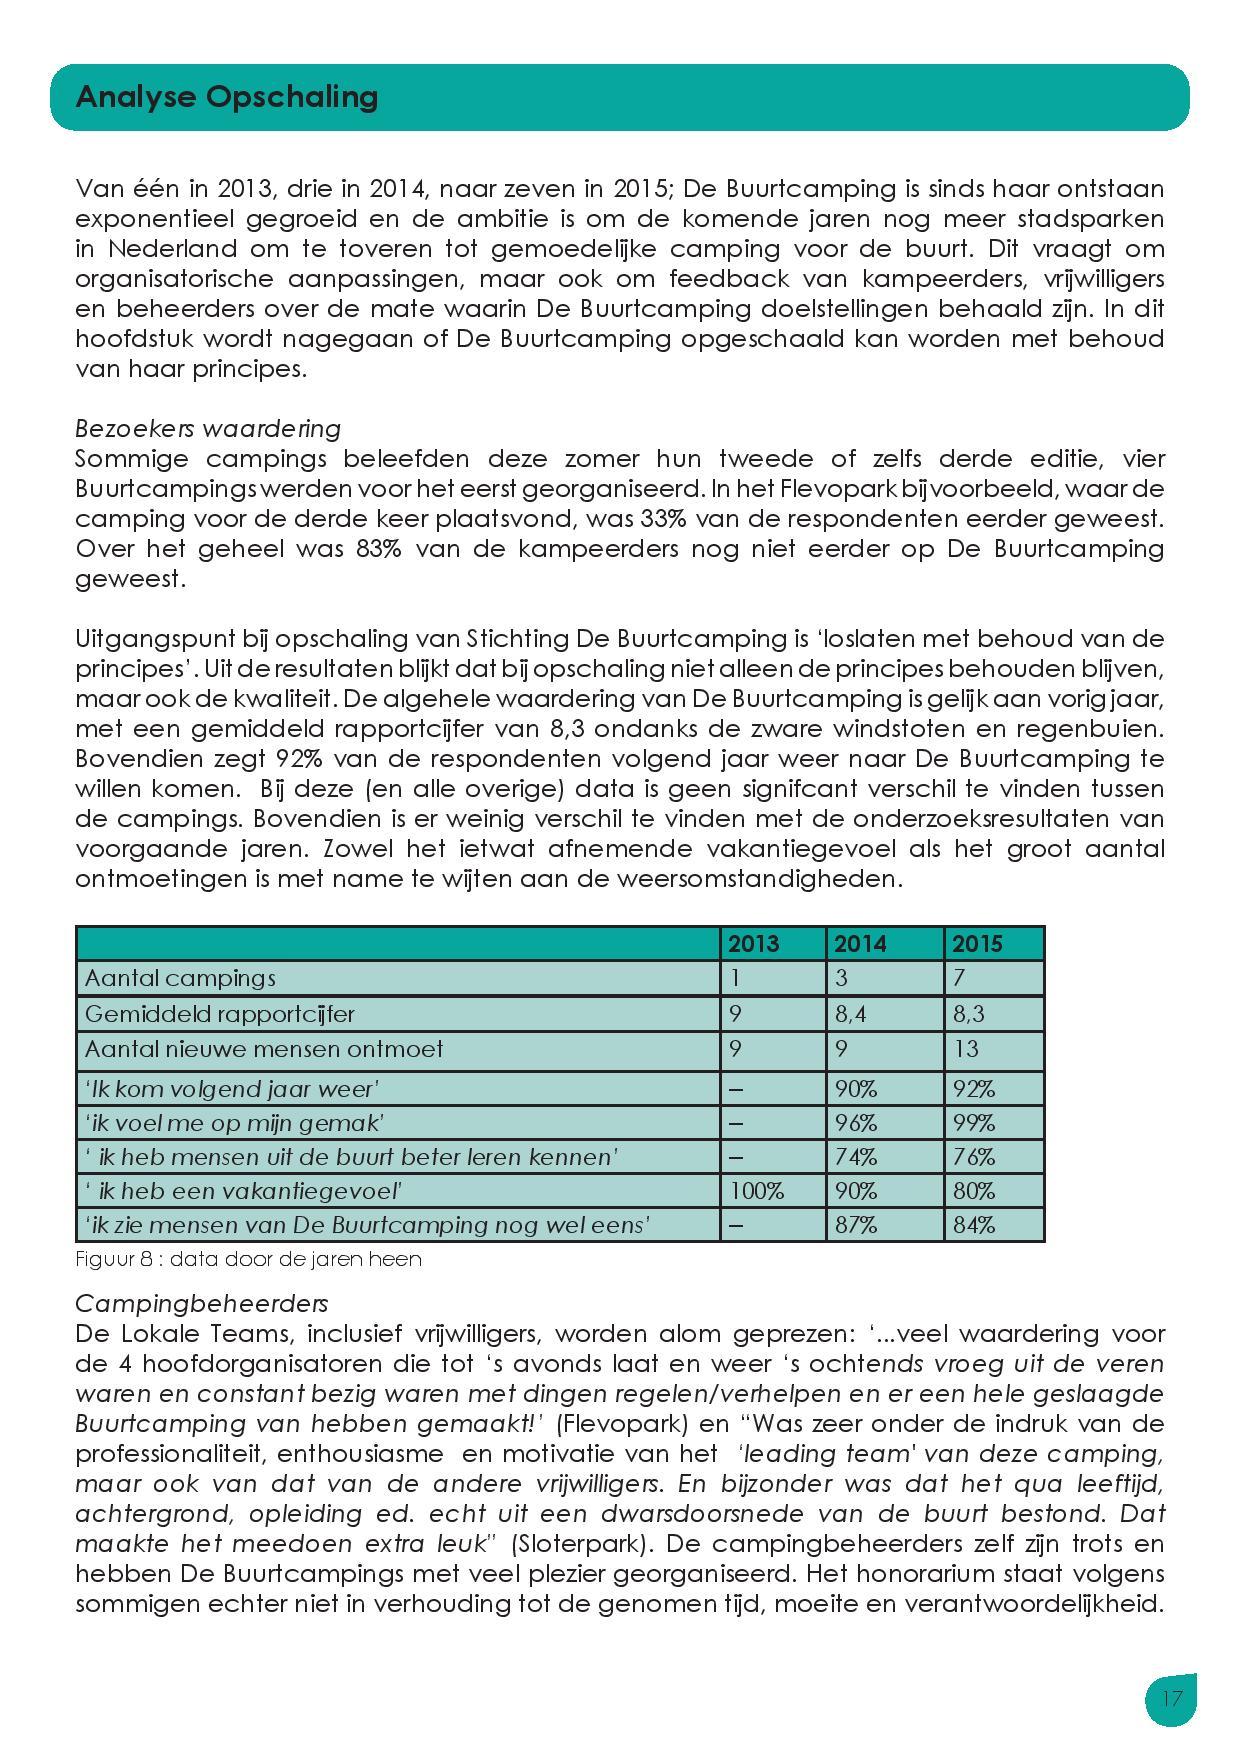 Buurtcamping_verslag_2015-page-019